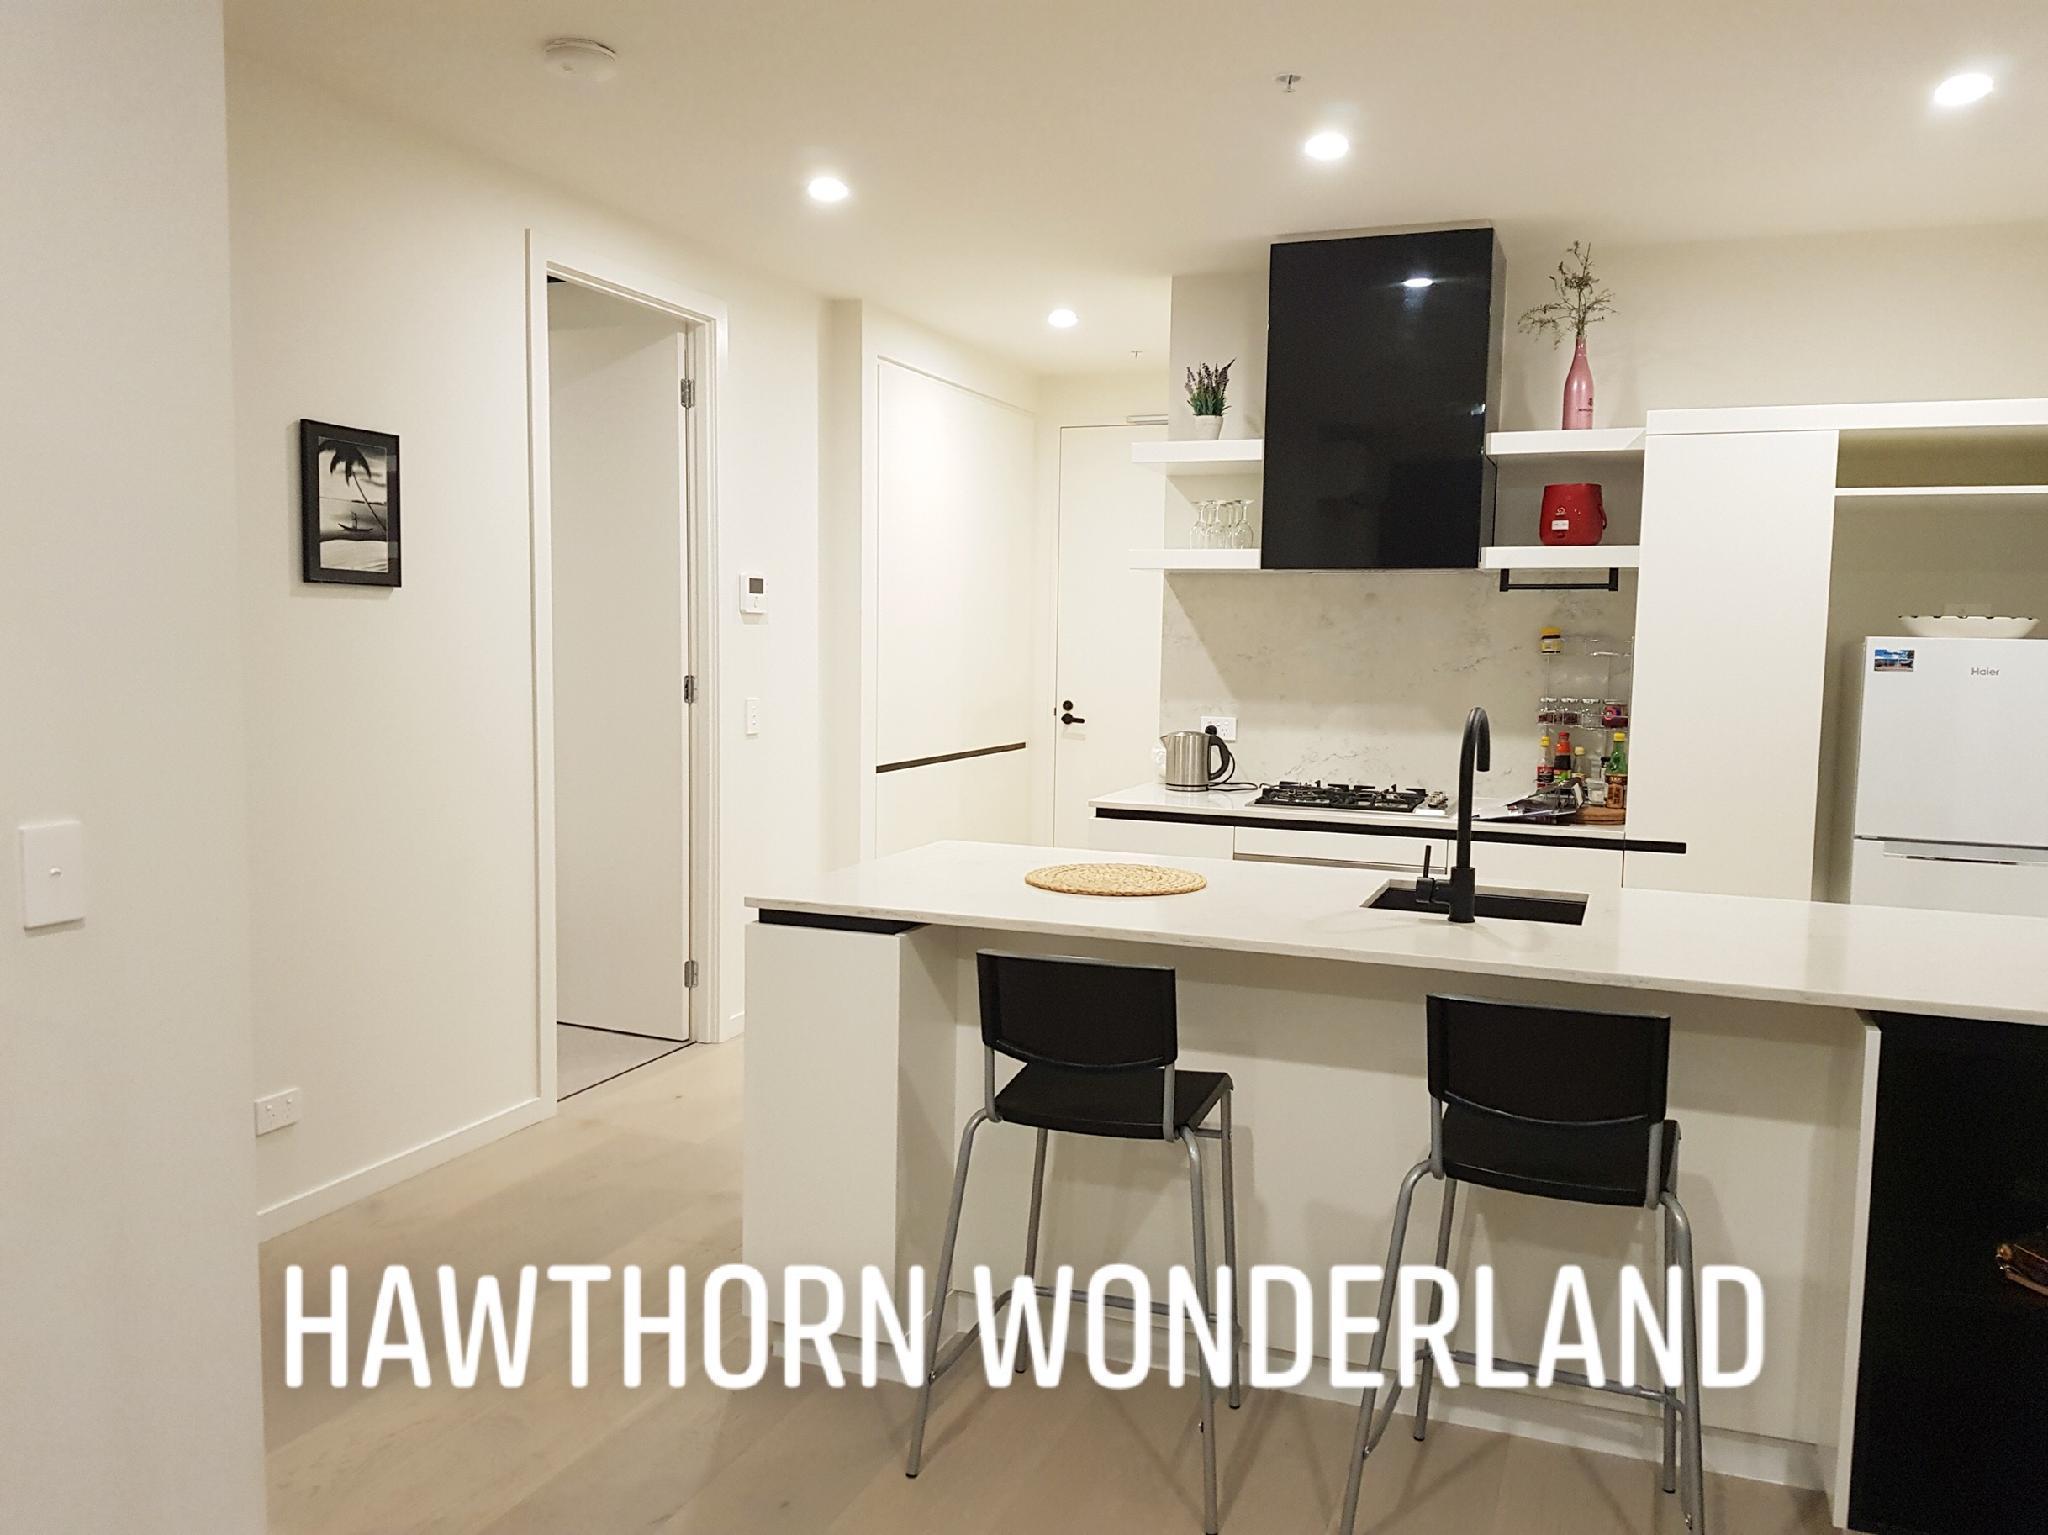 SPECIAL OFFER Hawthorn Wonderland